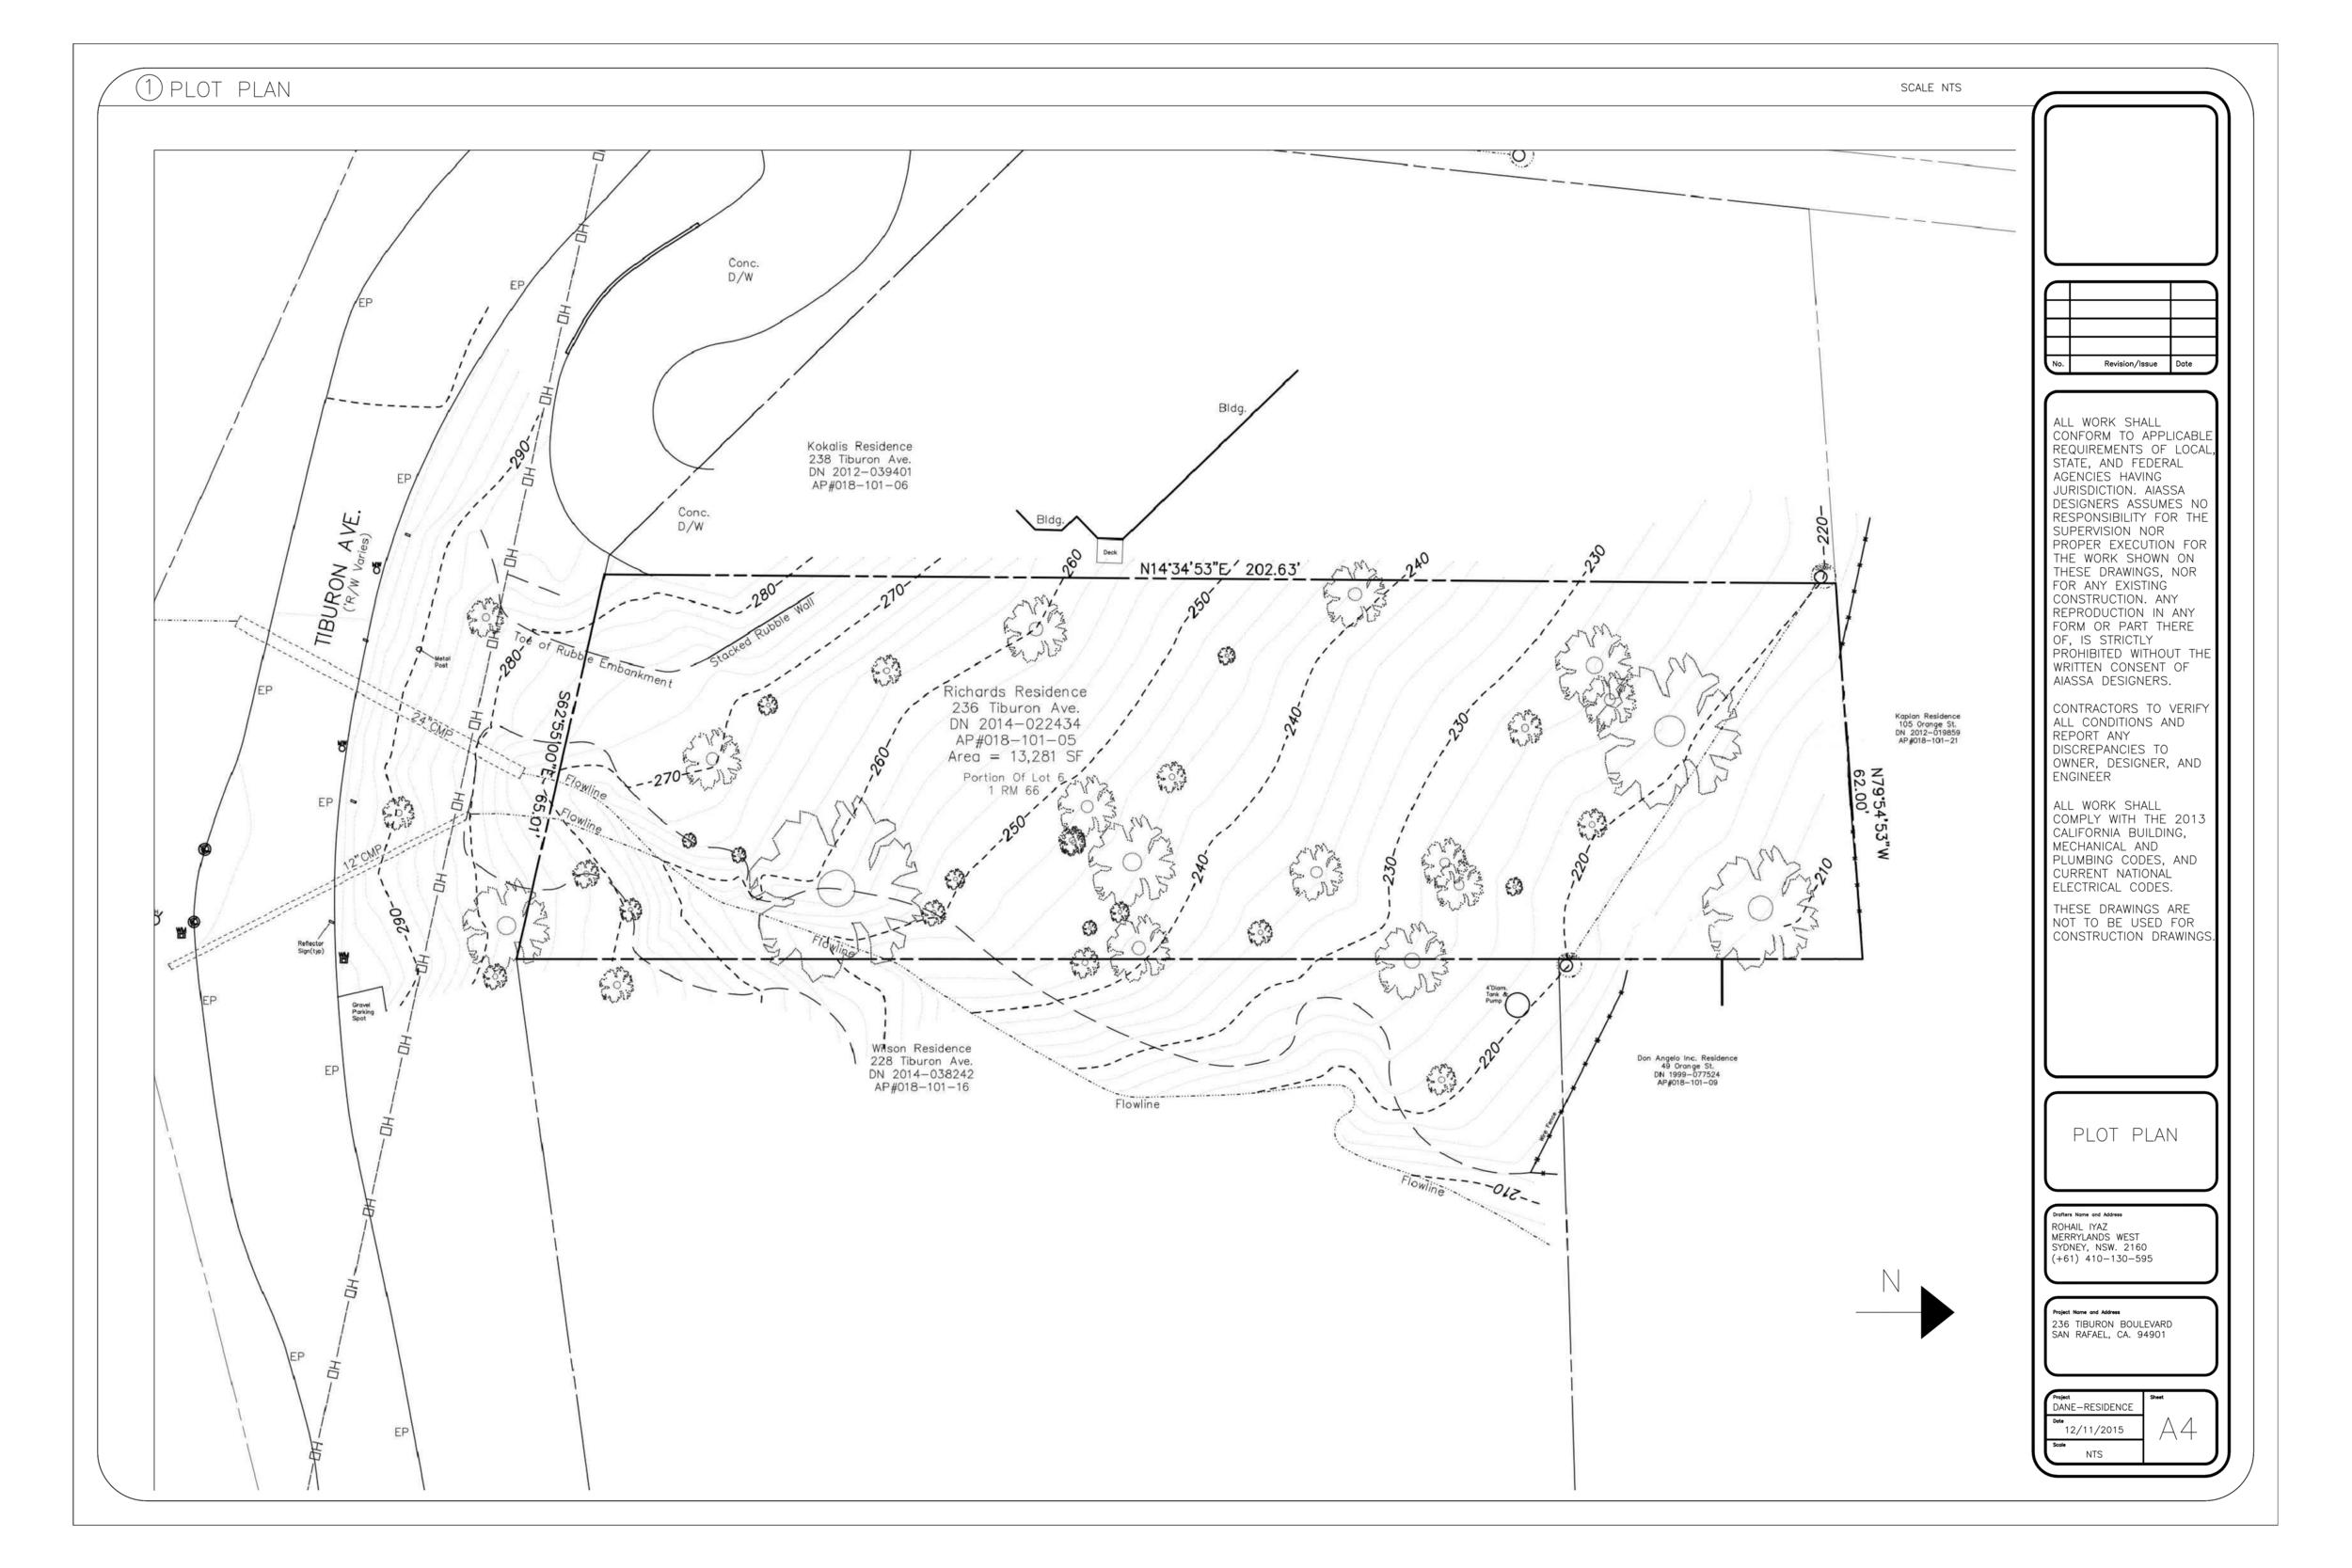 236 Tiburon Boulevard-PLOT PLAN-1.png